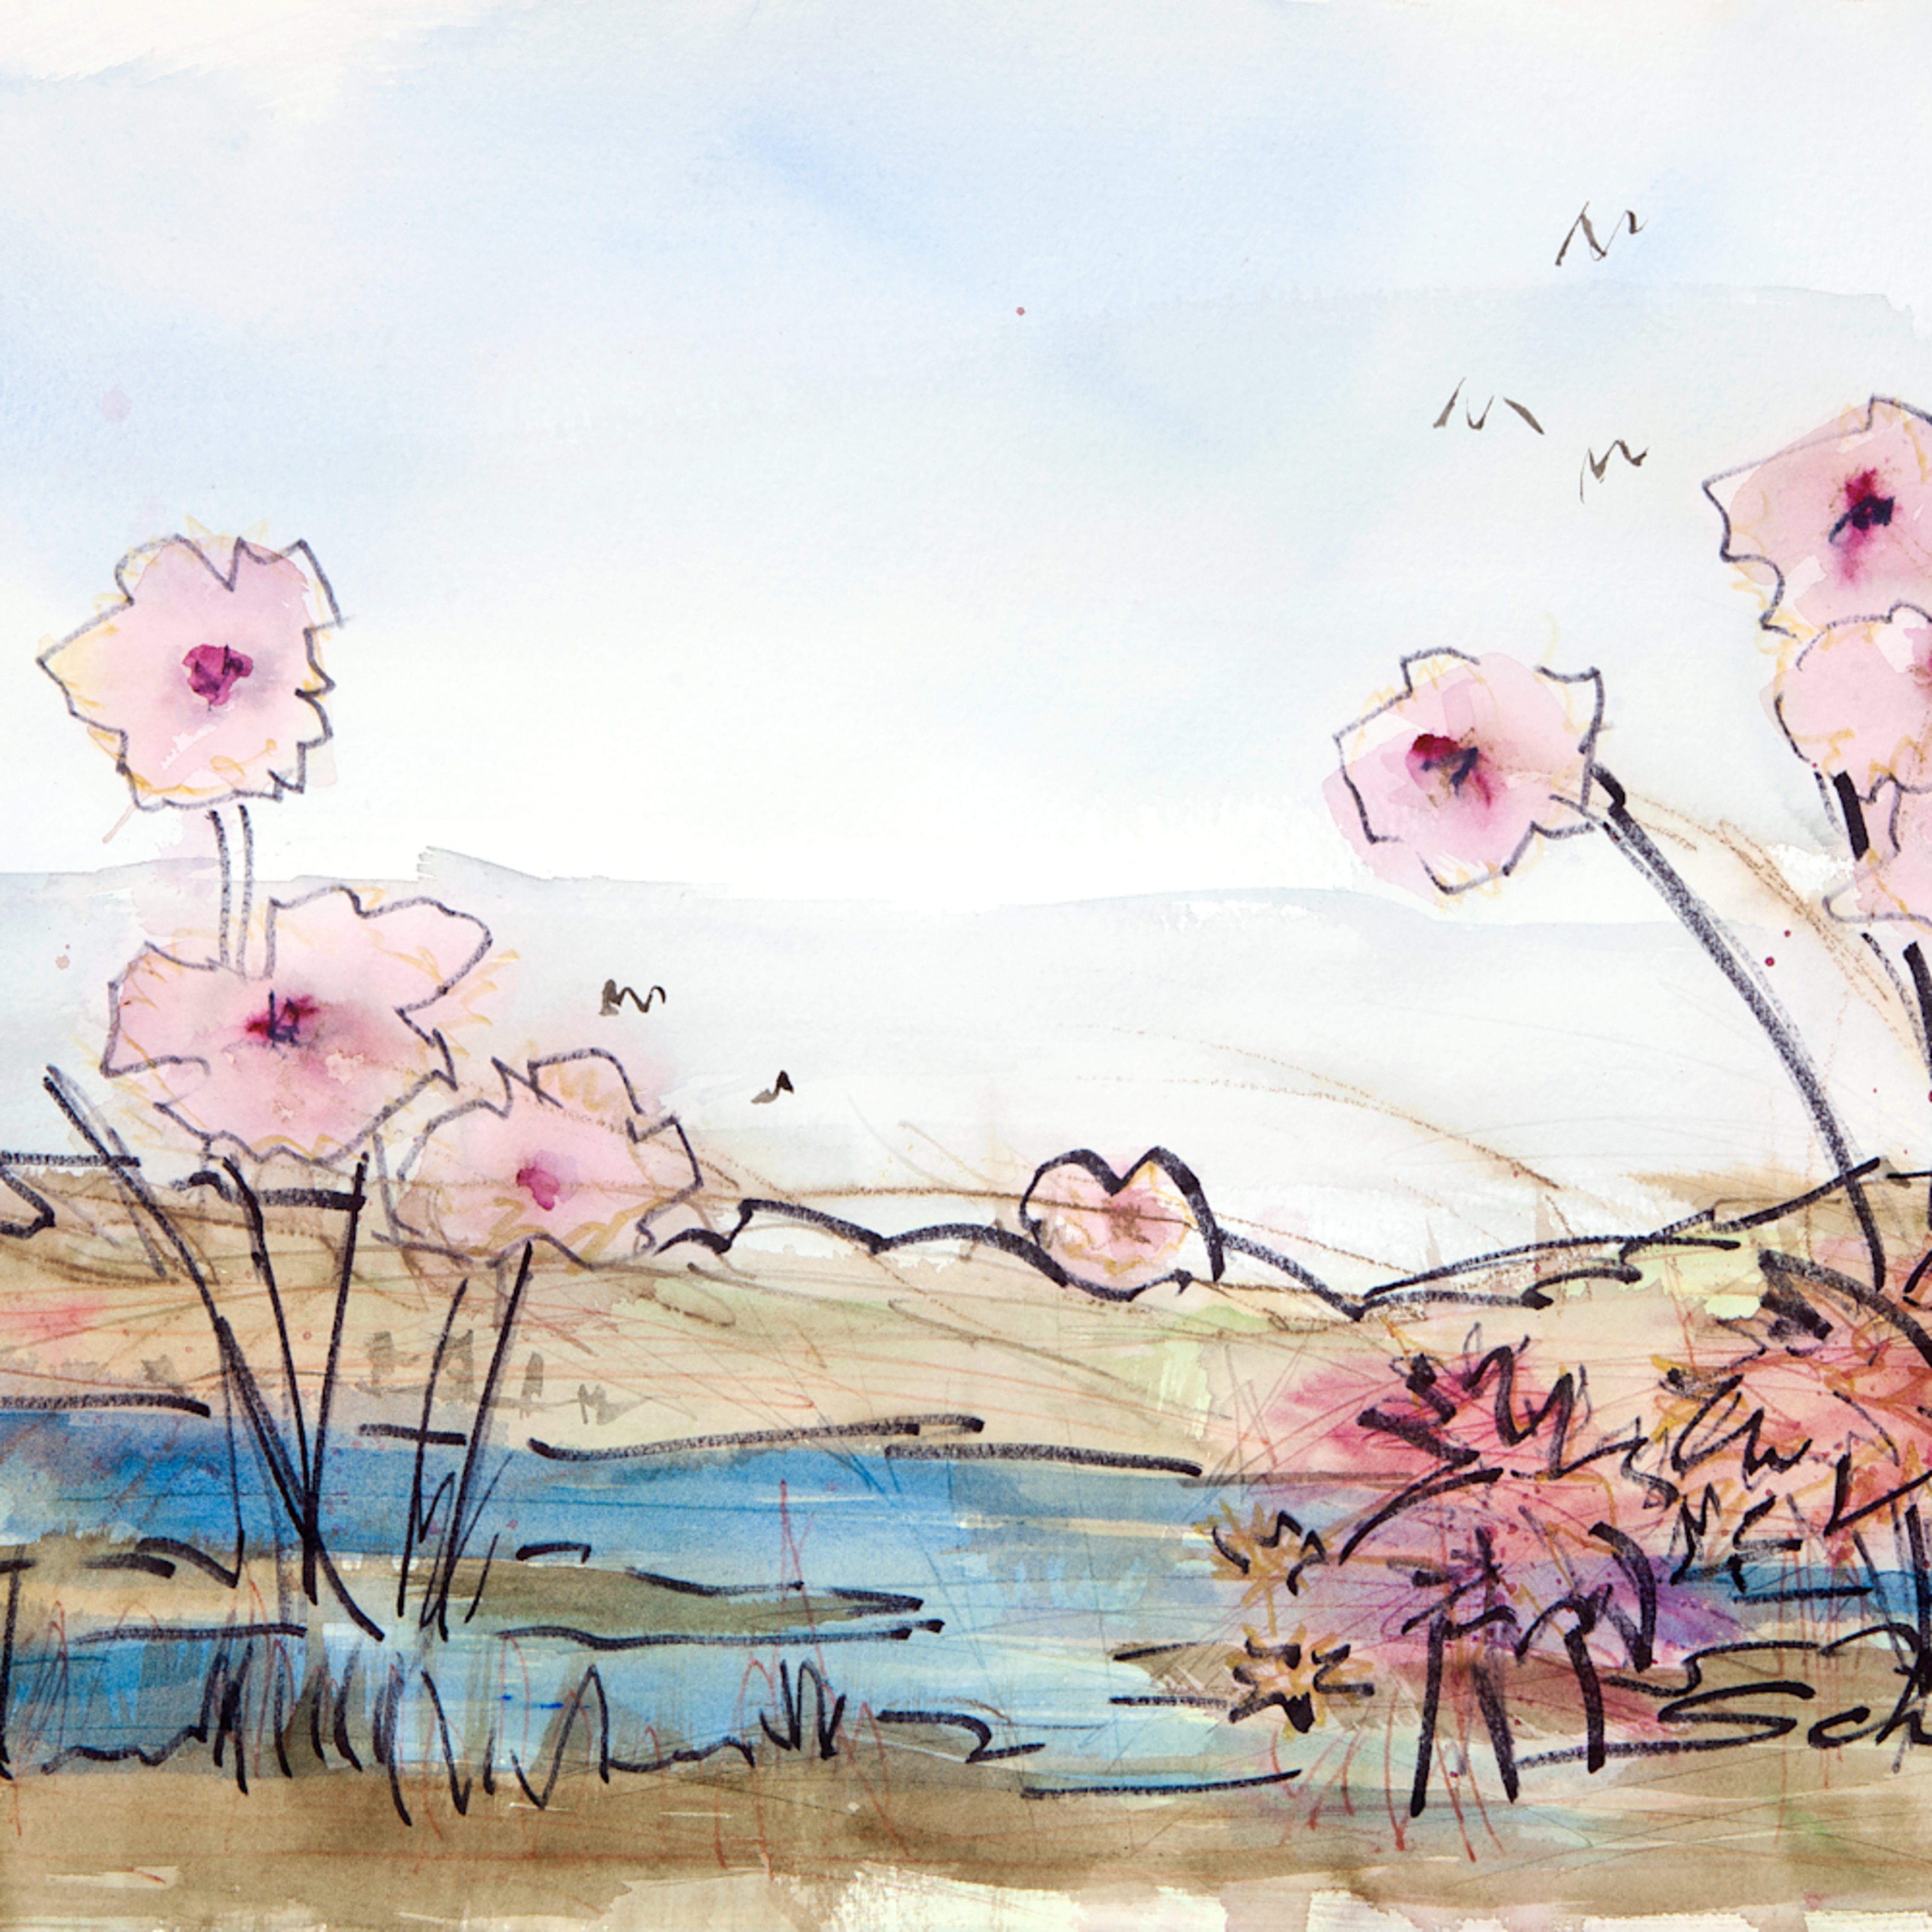 Marsh flowers mmwq0y